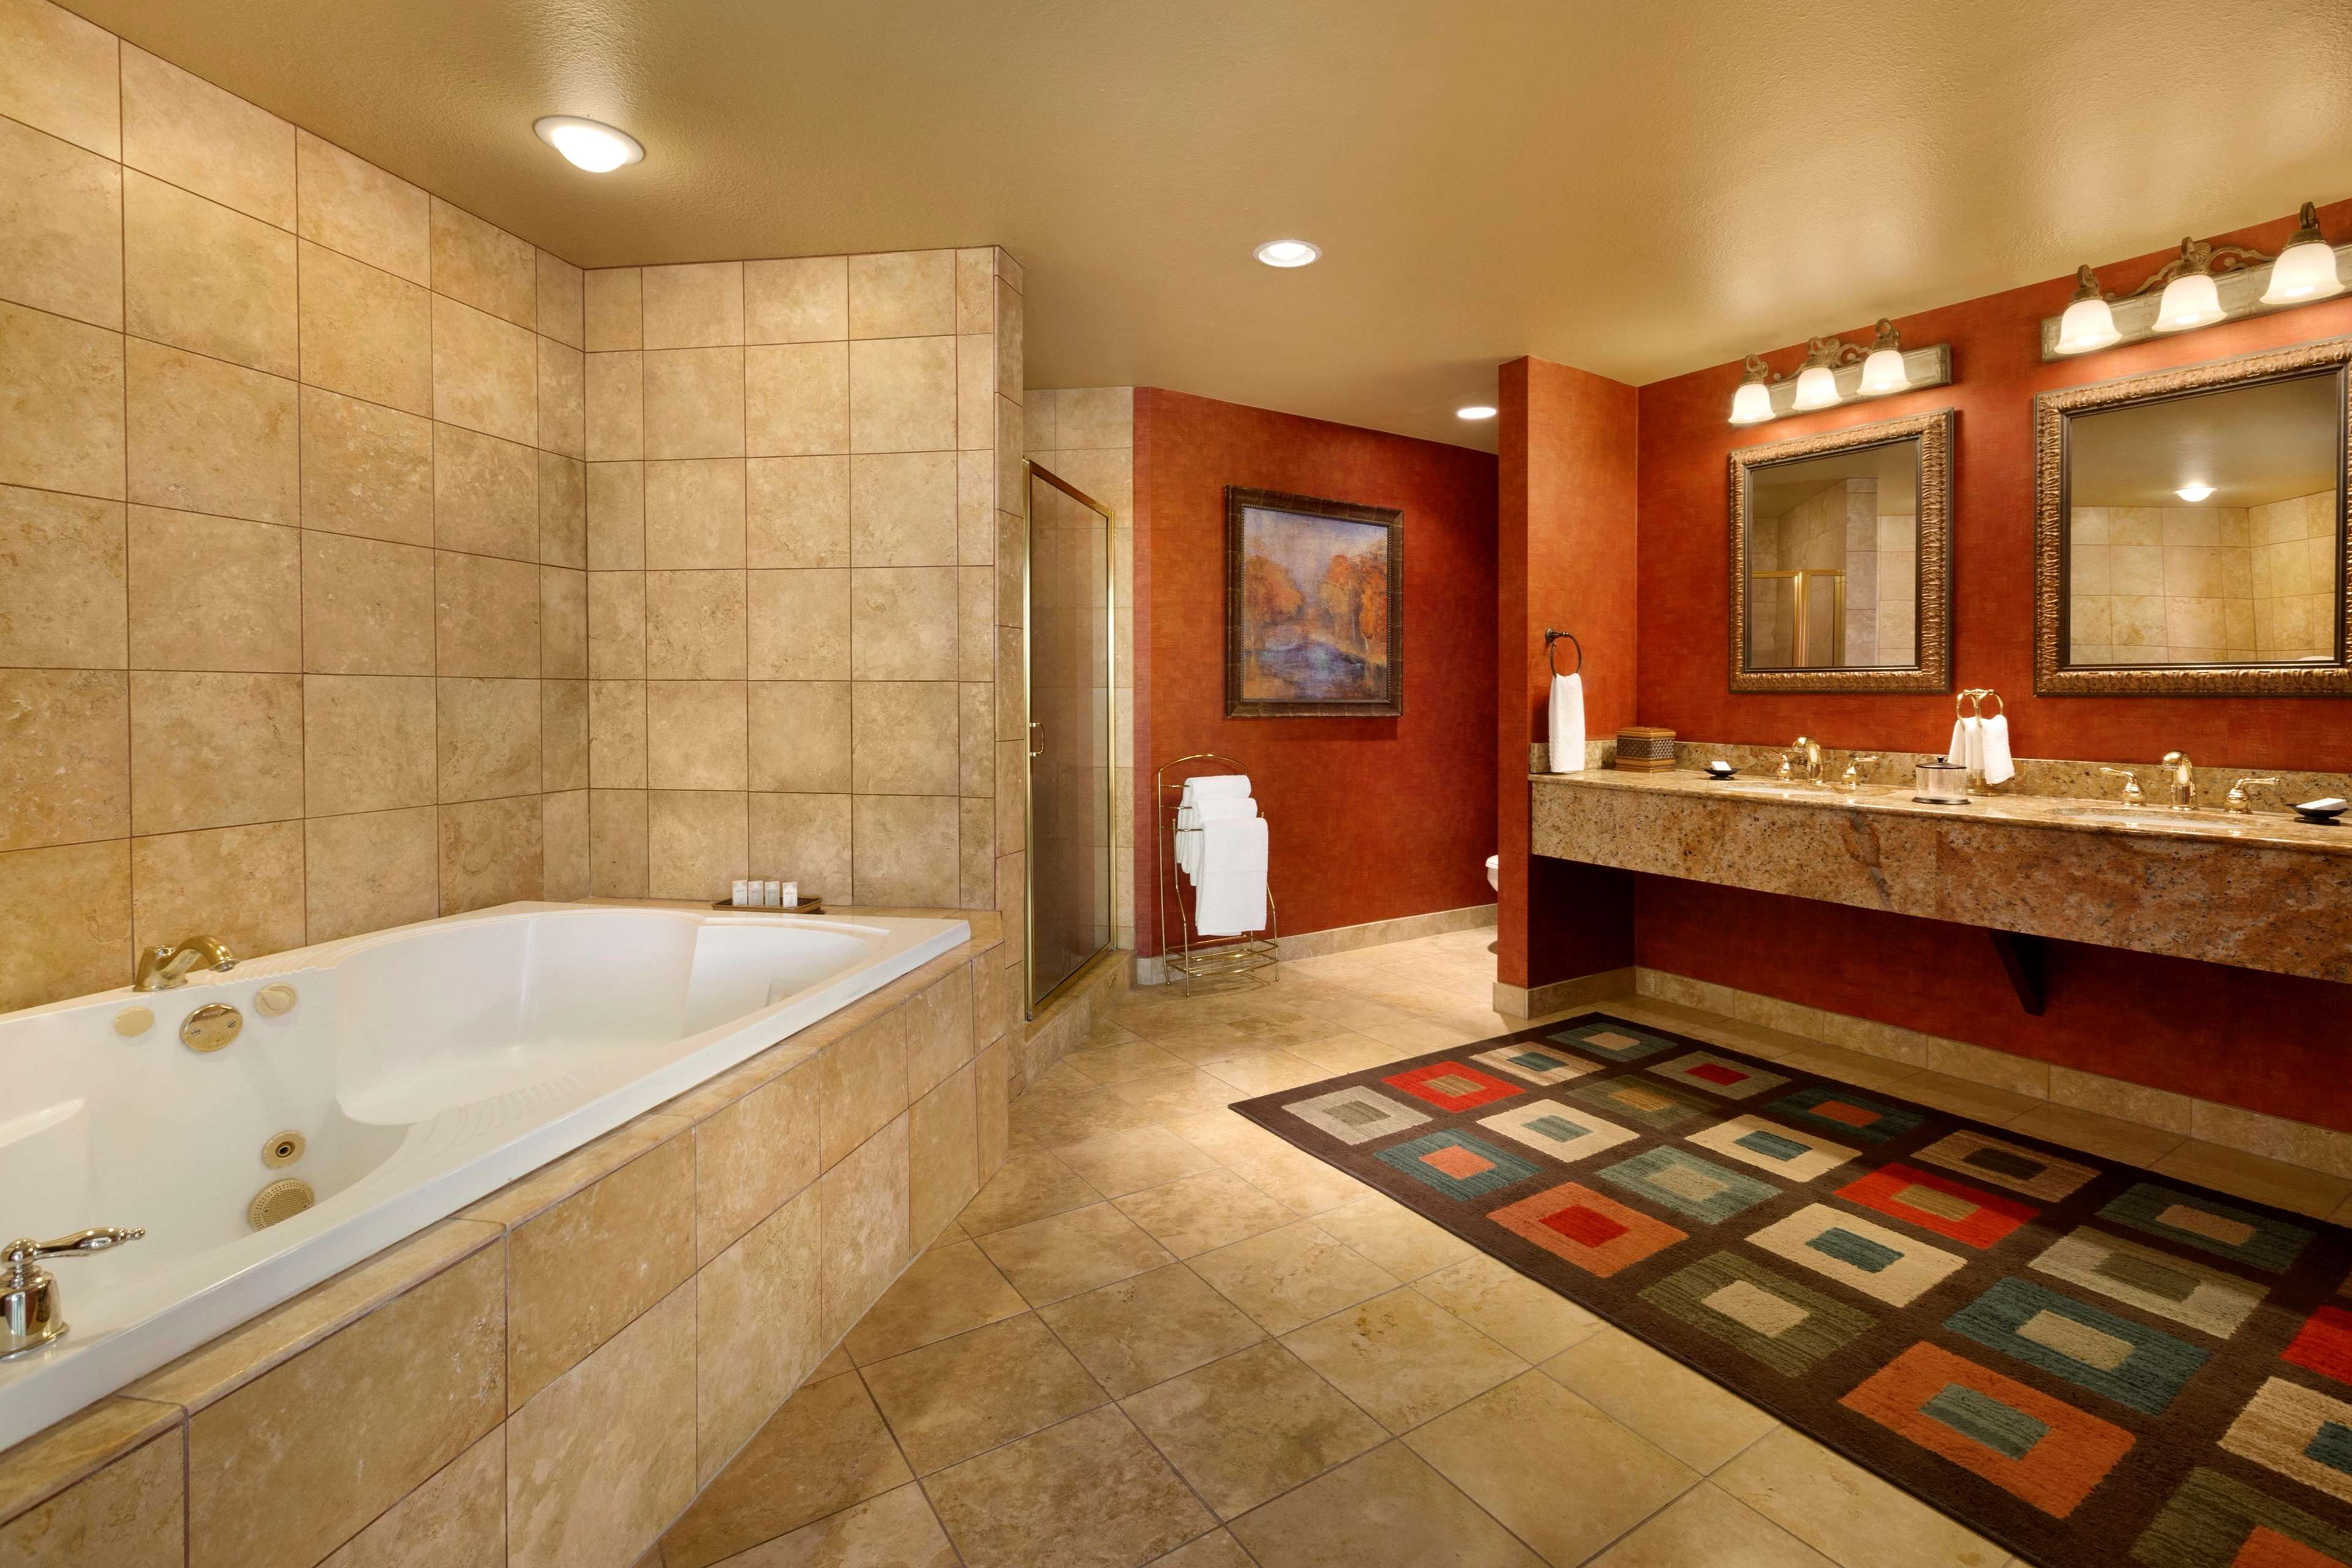 Embassy Suites by Hilton Albuquerque Hotel & Spa image 20